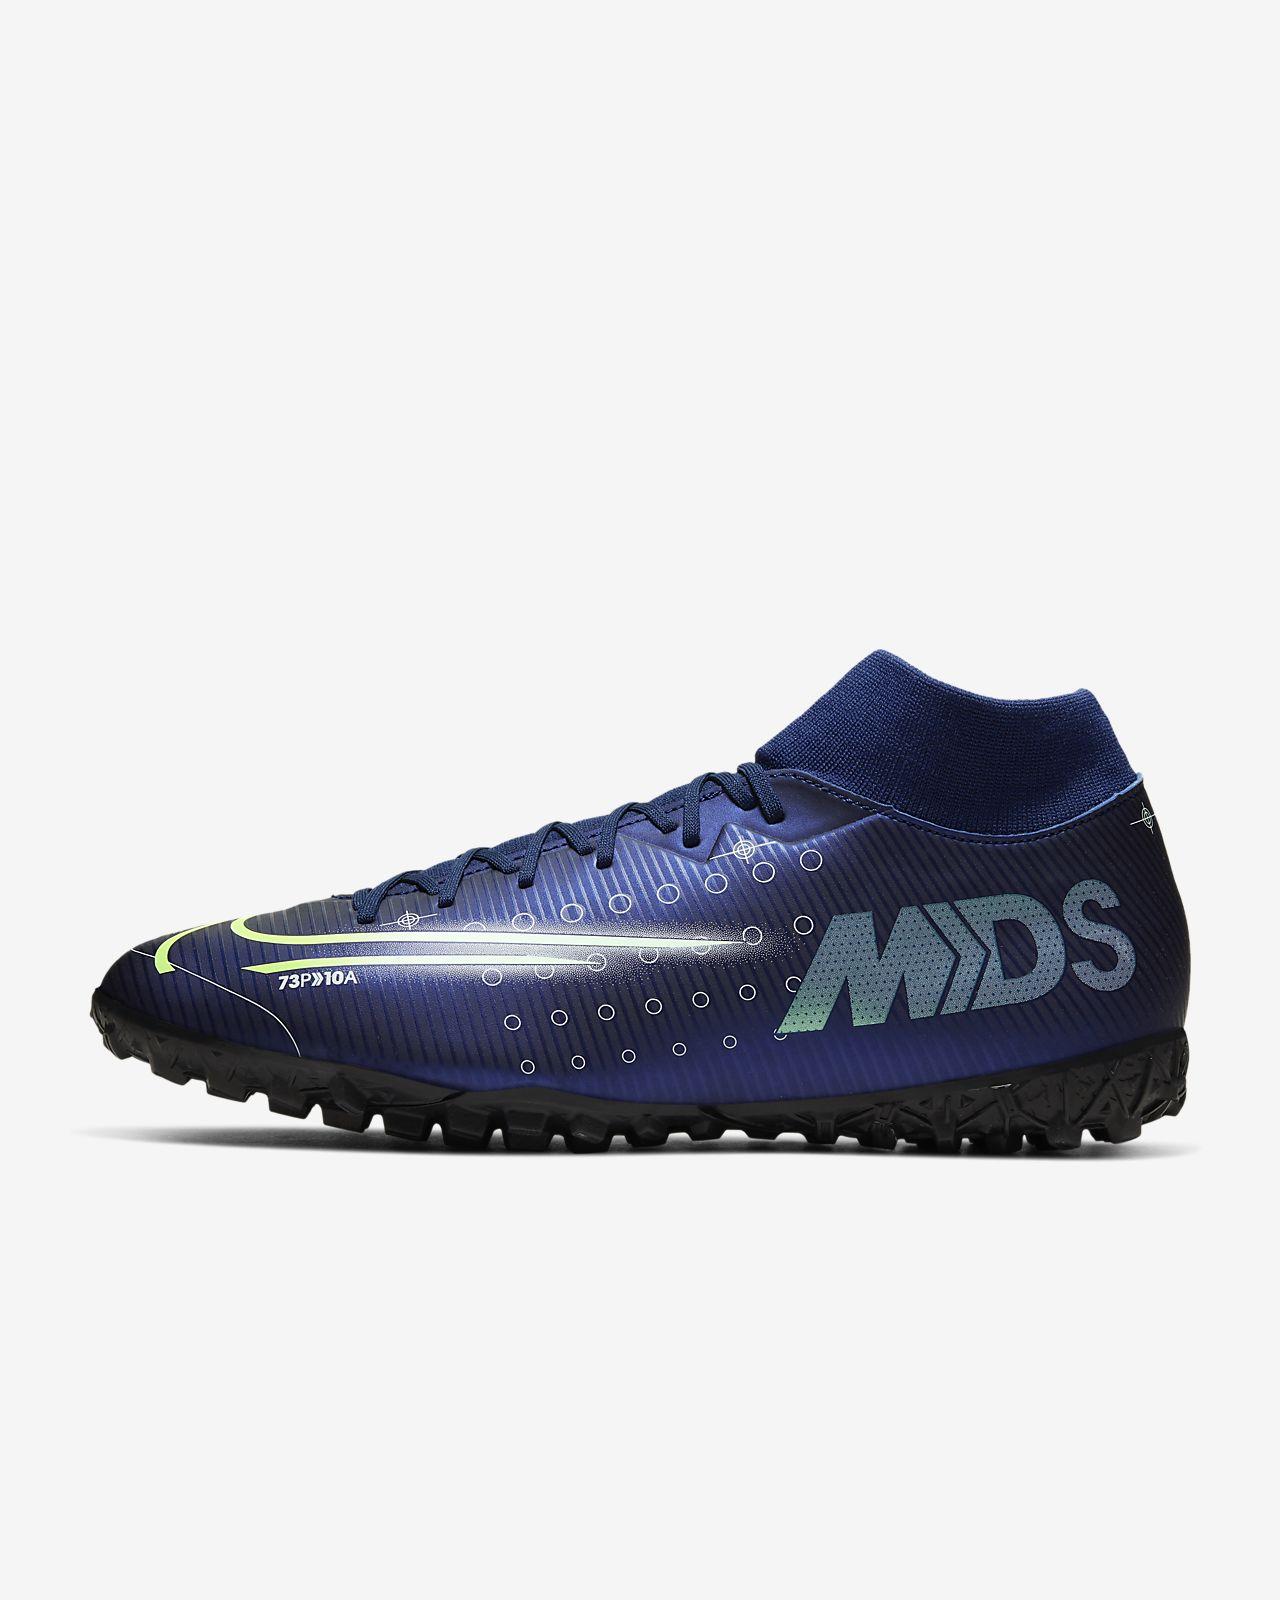 Calzado de fútbol para césped deportivo artificial Nike Mercurial Superfly 7 Academy MDS TF